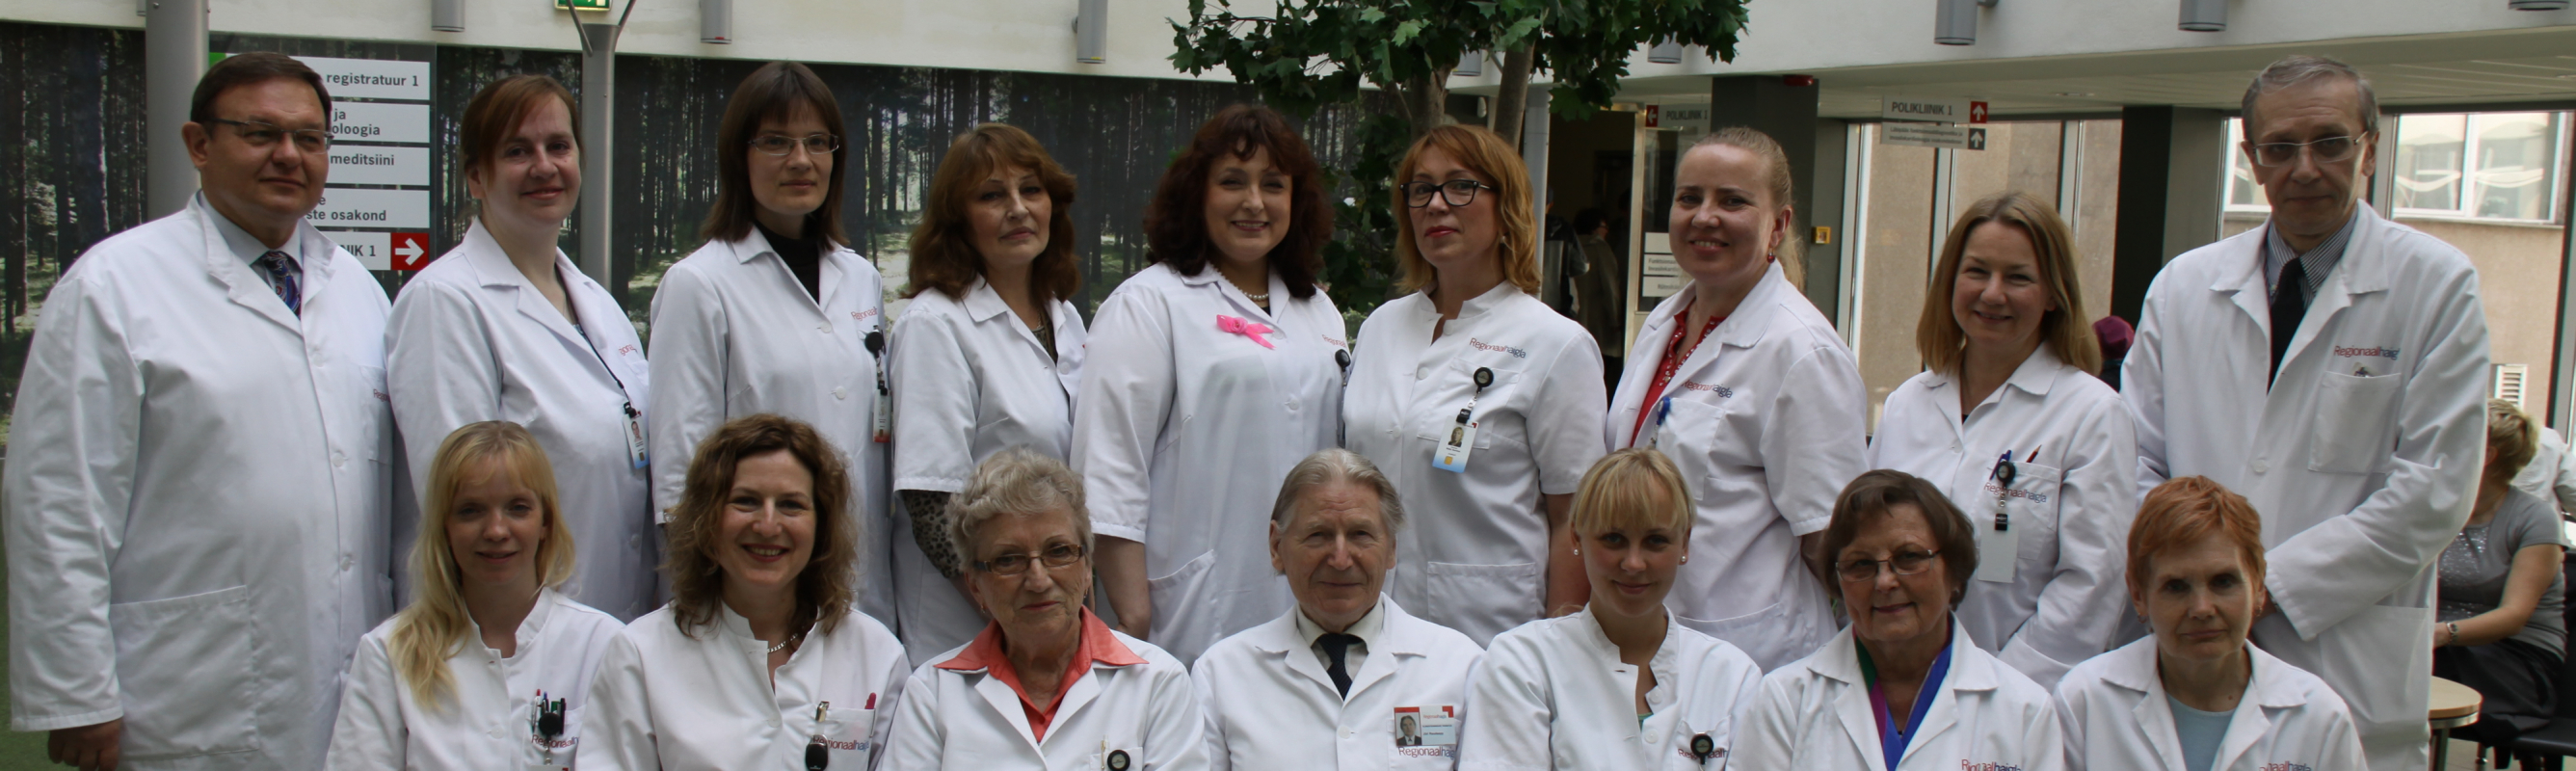 Palliatiivravi töögrupp